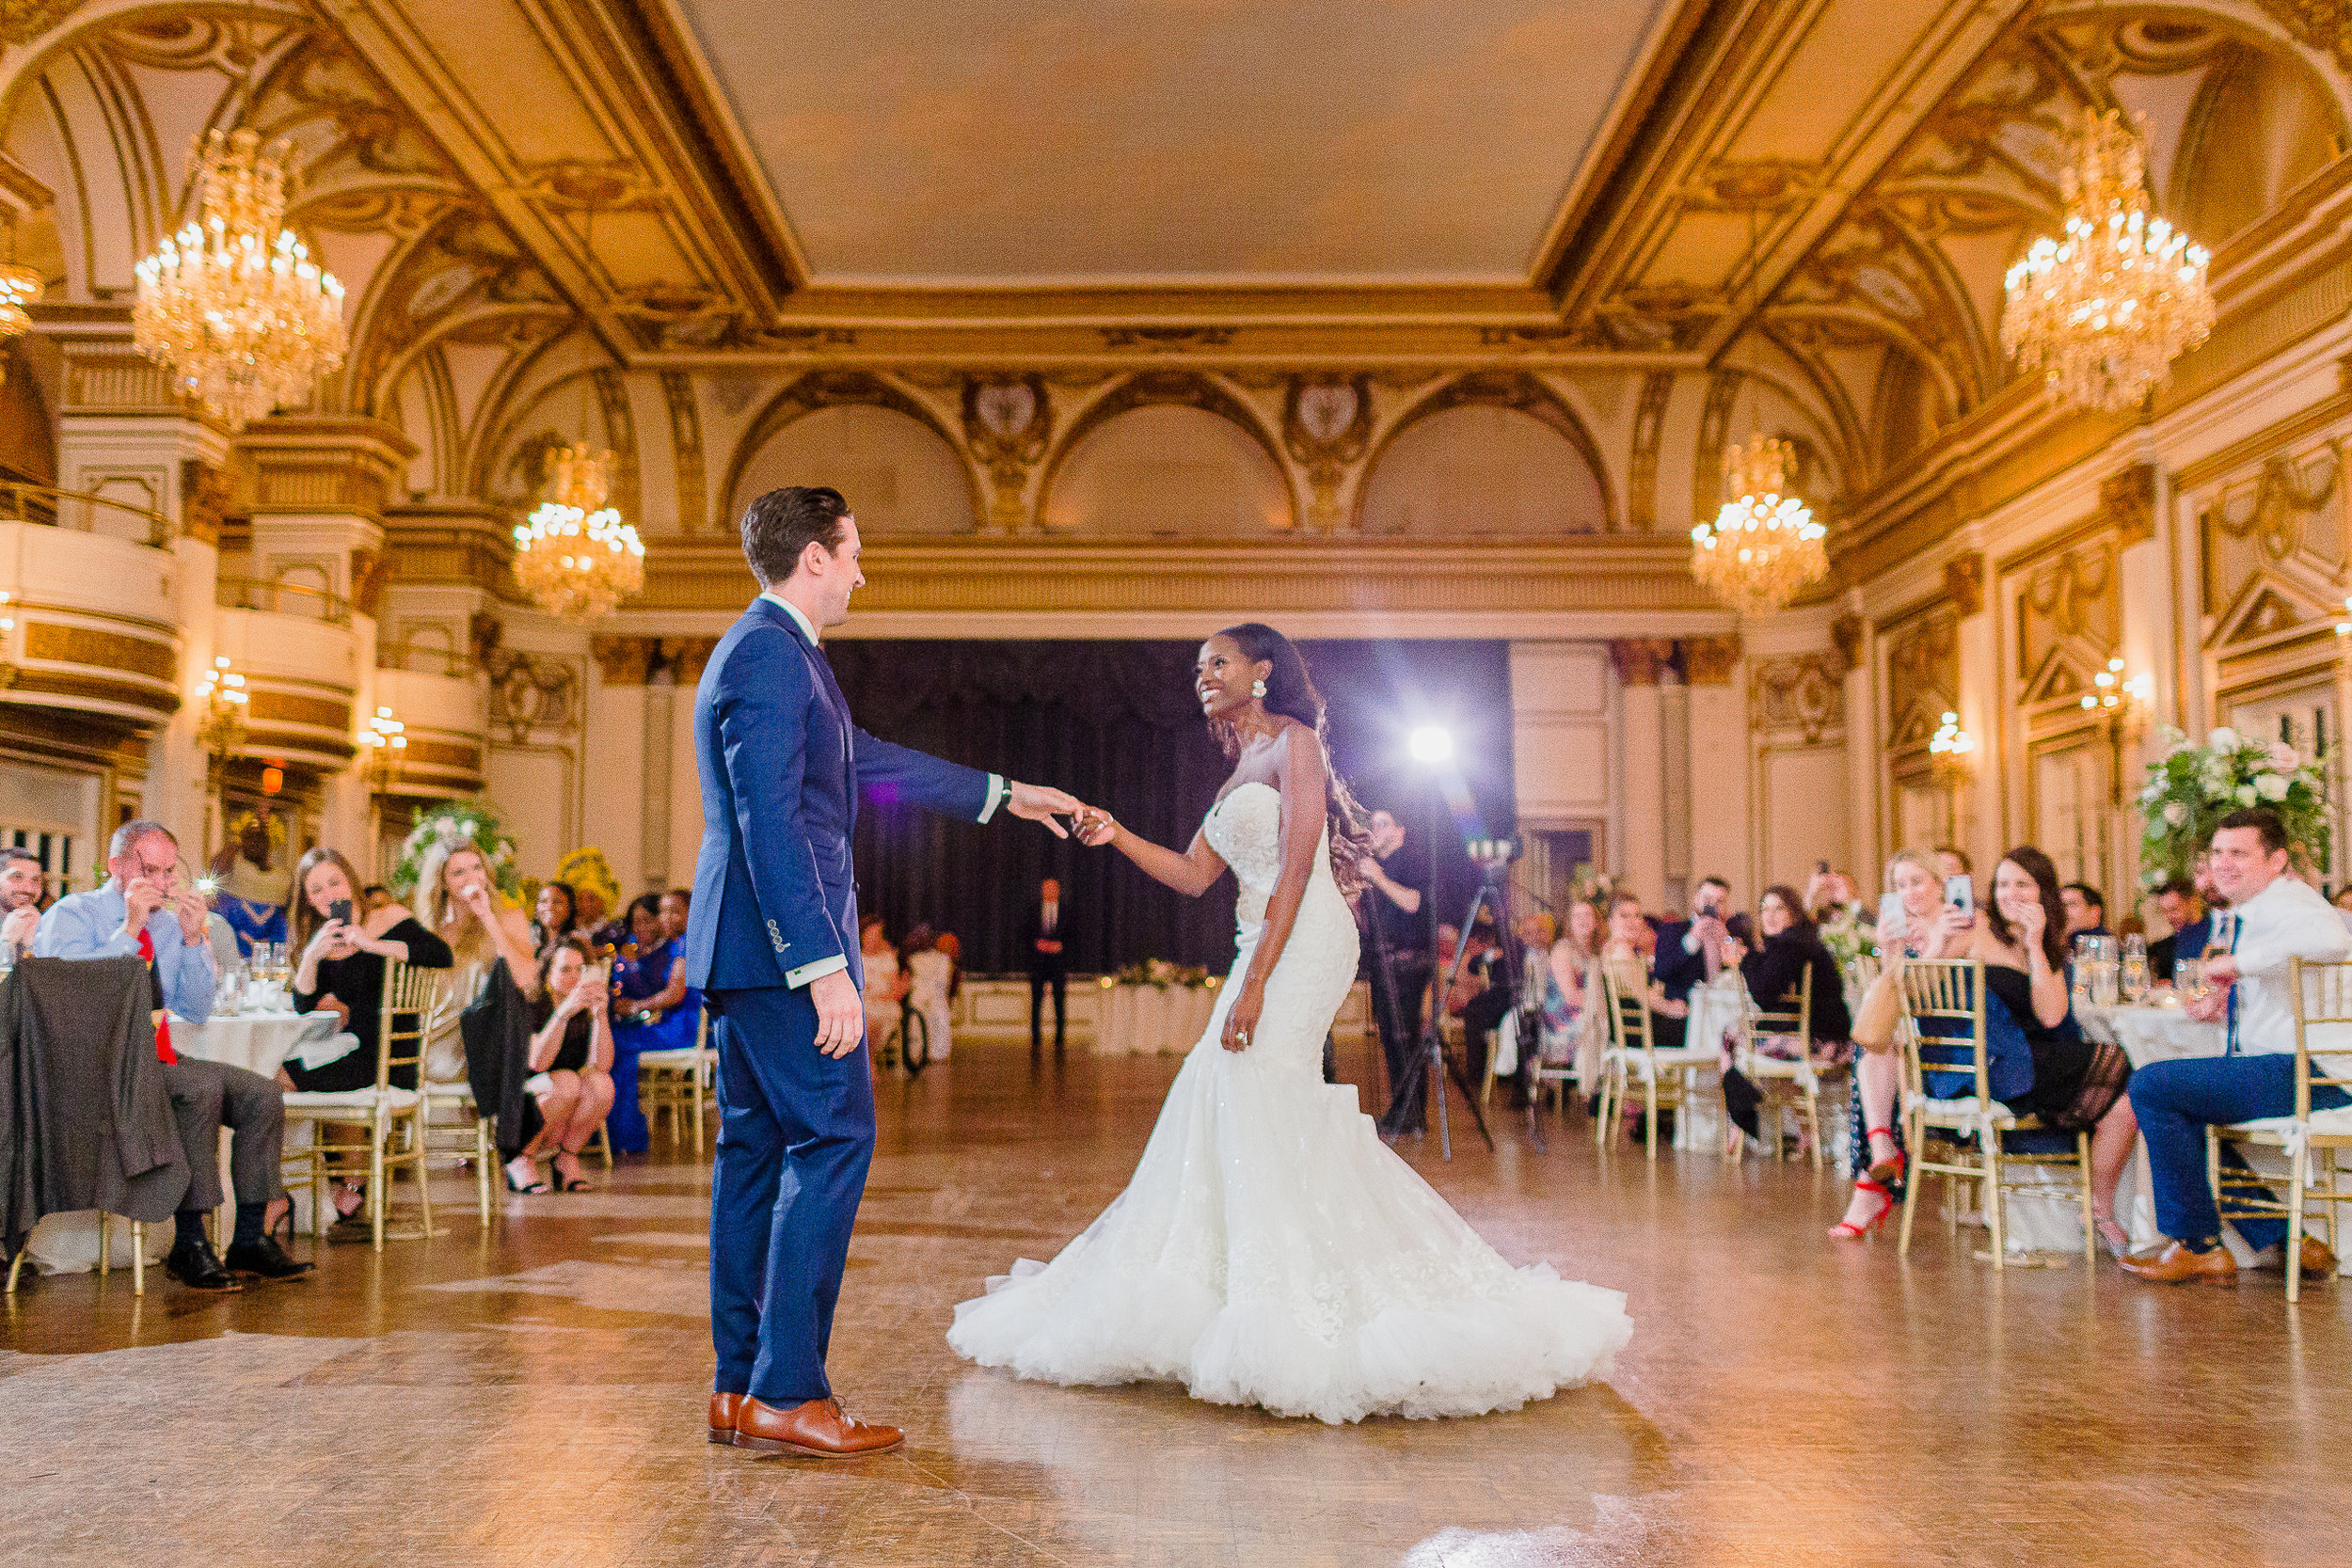 fairmont-copley-plaza-wedding-photos-00751.JPG